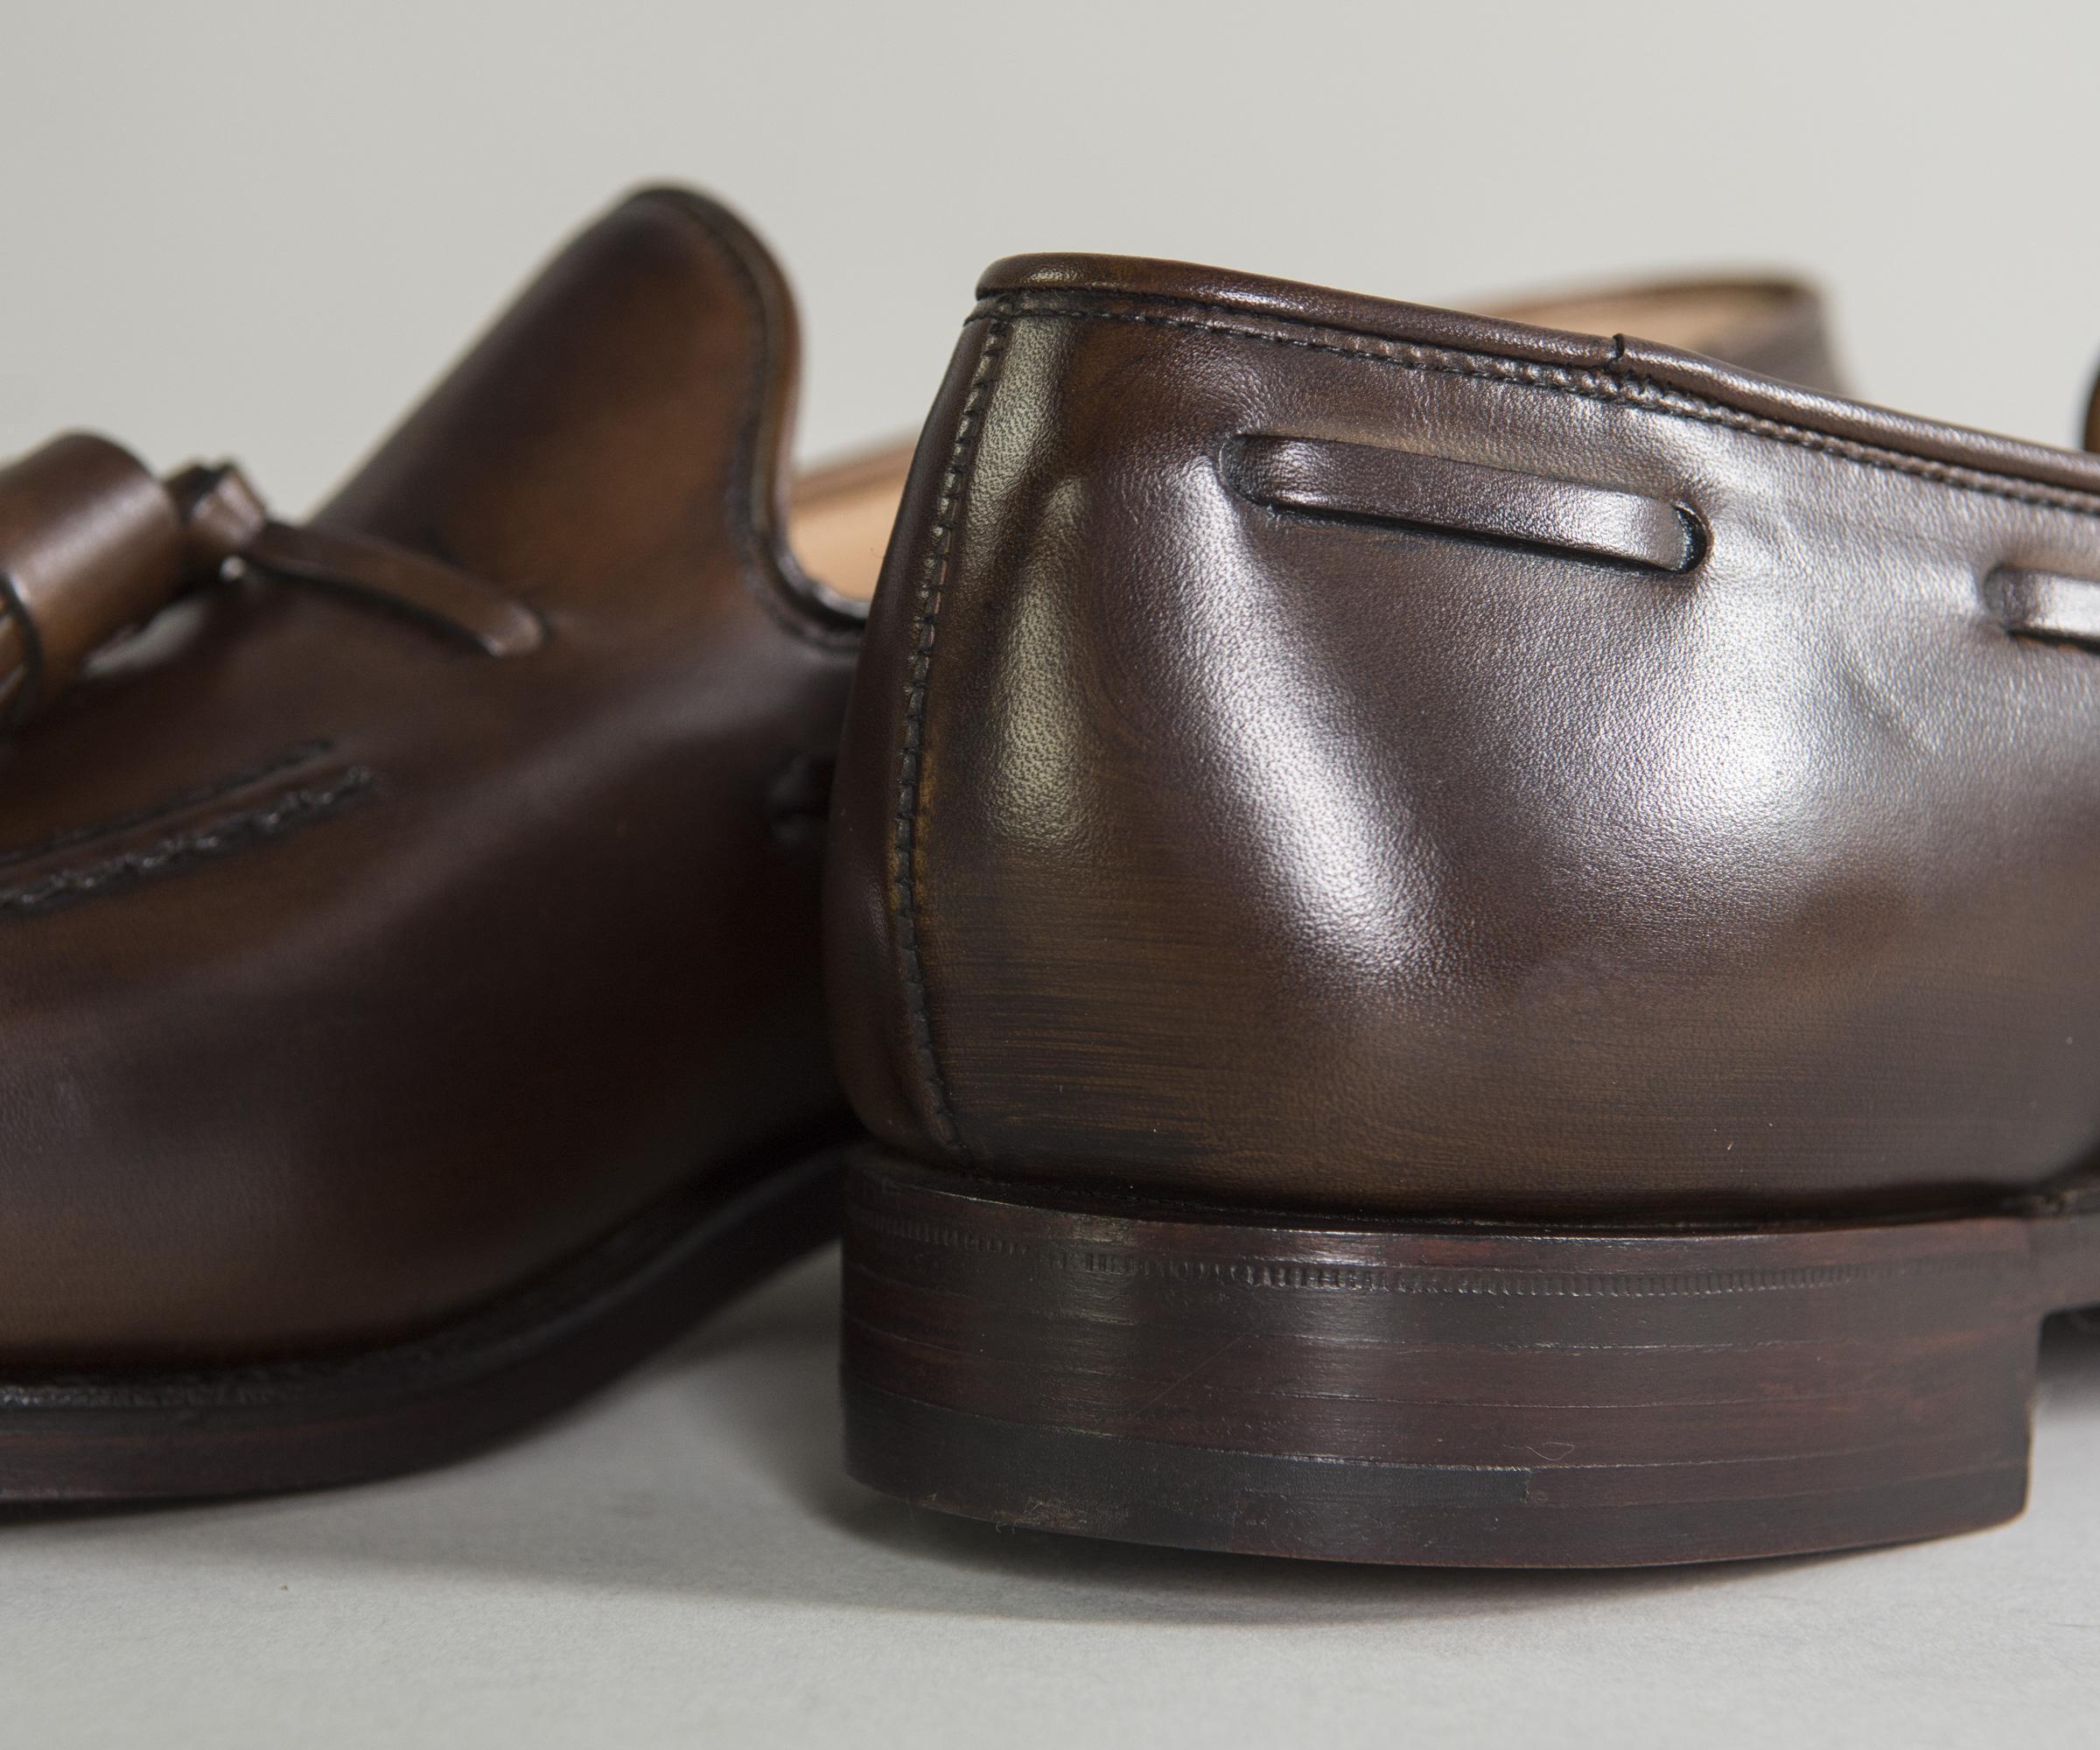 e39db2ba348 Crockett and Jones -  cavendish  Burnished Calf Leather Loafers Dark Brown  for Men -. View fullscreen